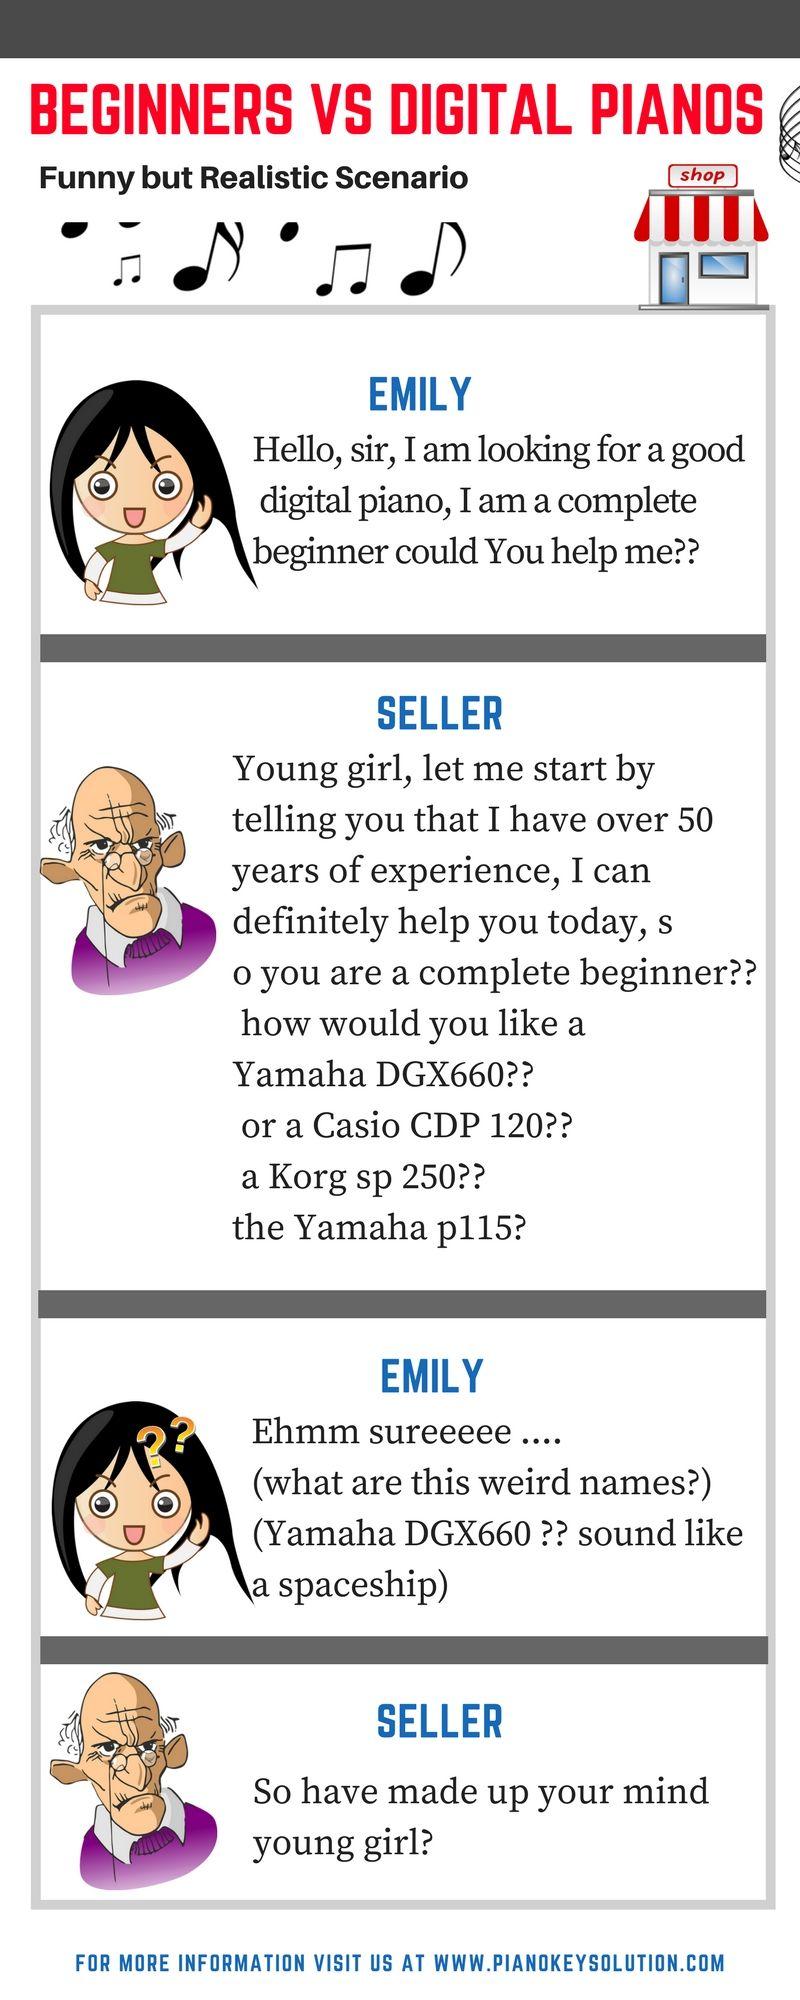 Girl vs Digital piano funny infographic